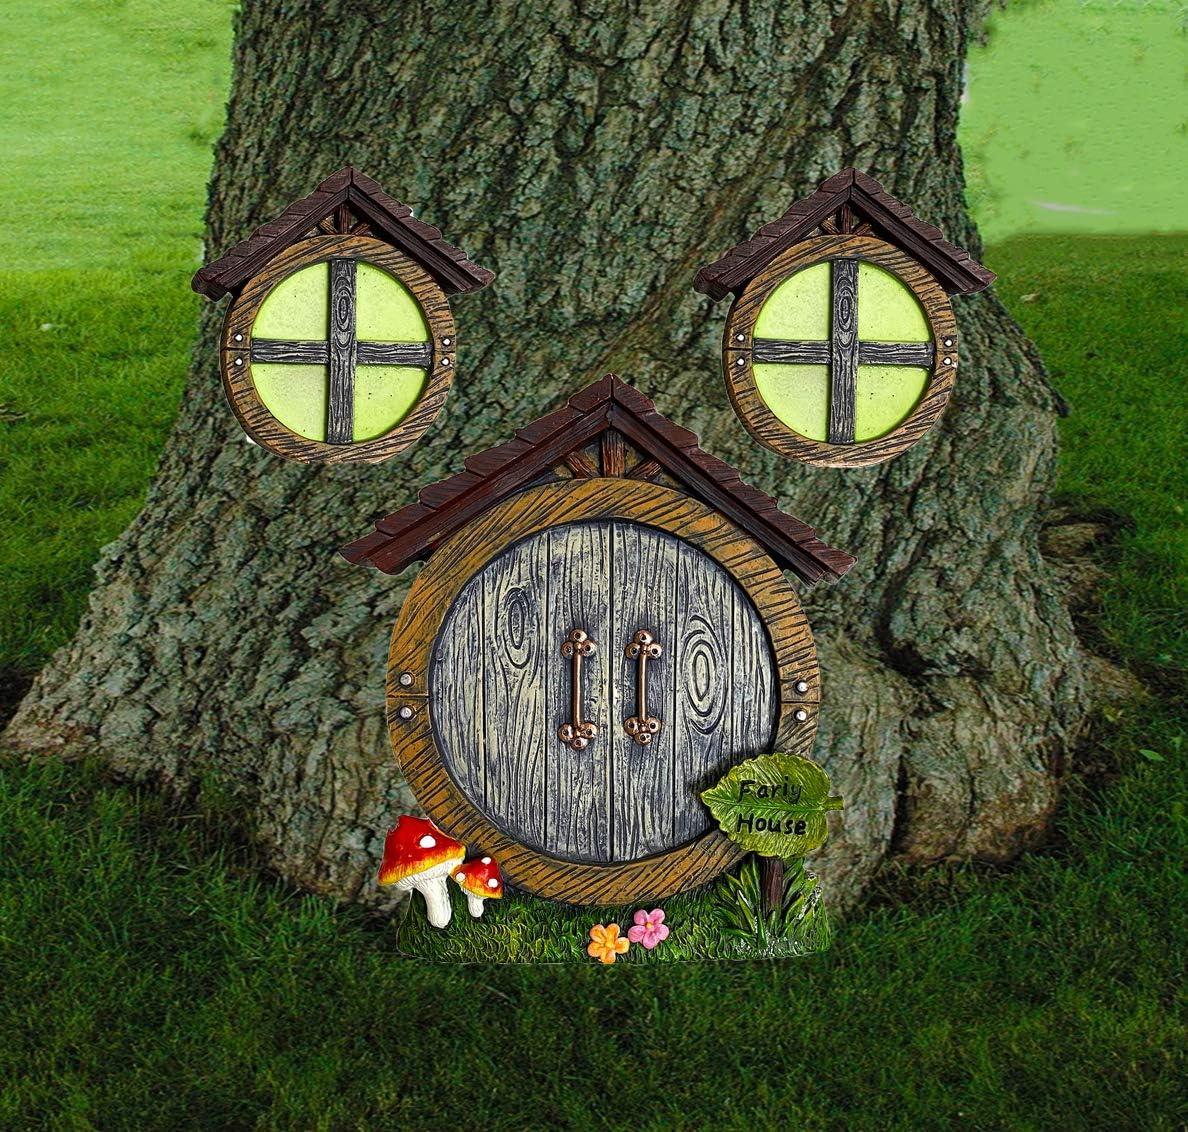 ALLADINBOX Miniature Gnome Fairy House Window and Door with Flowers Mushrooms for Trees Decoration, Glow in Dark Fairies Sleeping Door and Windows, Yard Art Garden Sculpture, Lawn Ornament Décor